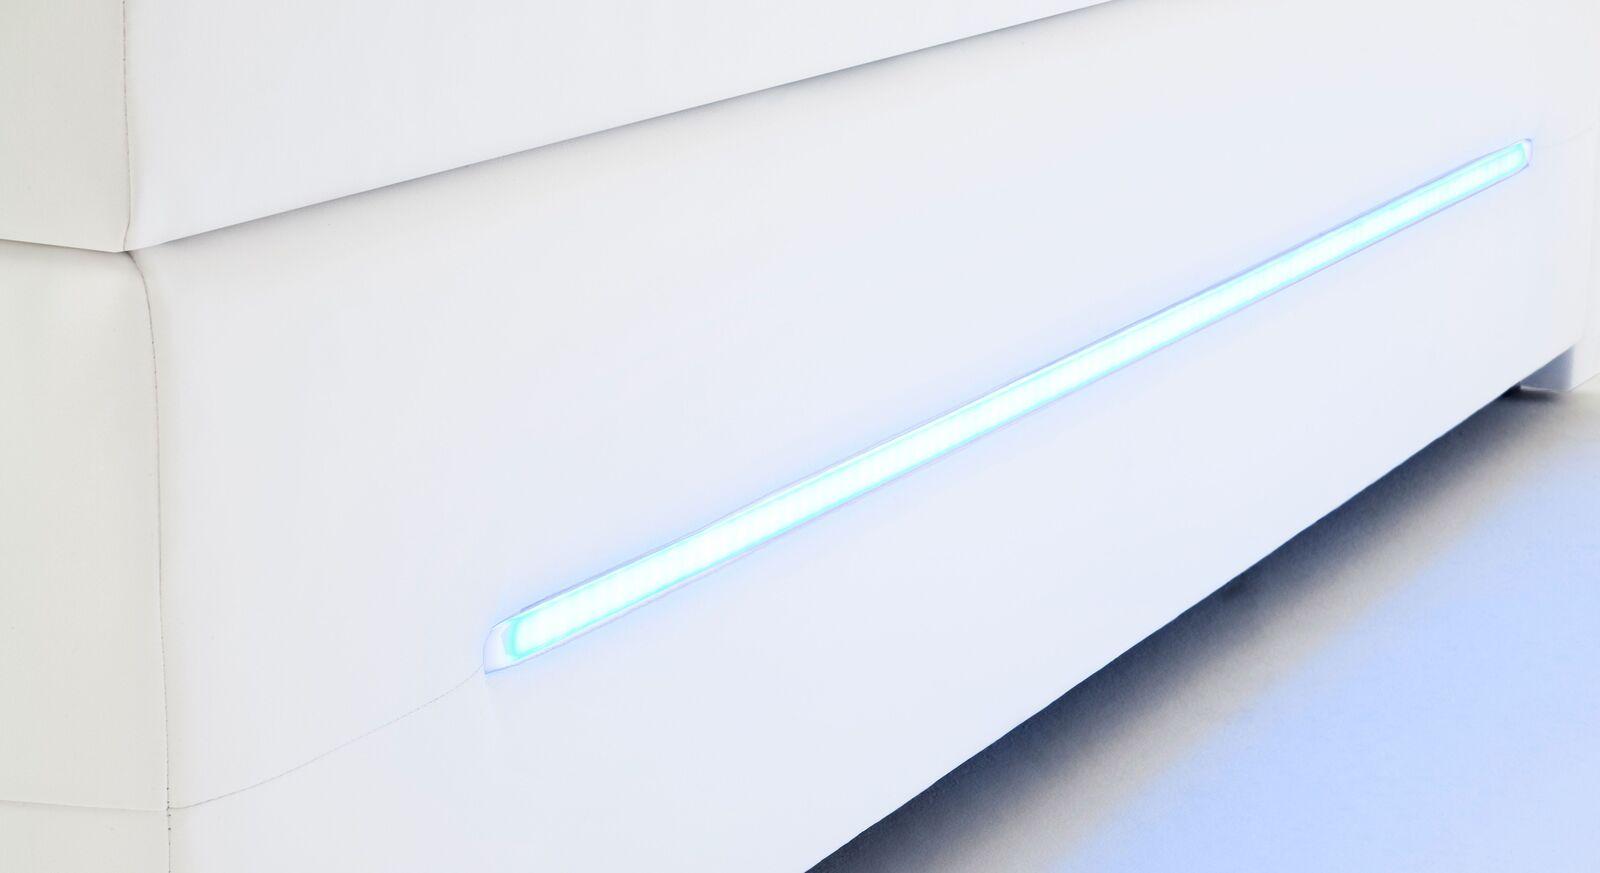 Boxspringbett Lexton mit seitlicher LED-Beleuchtung